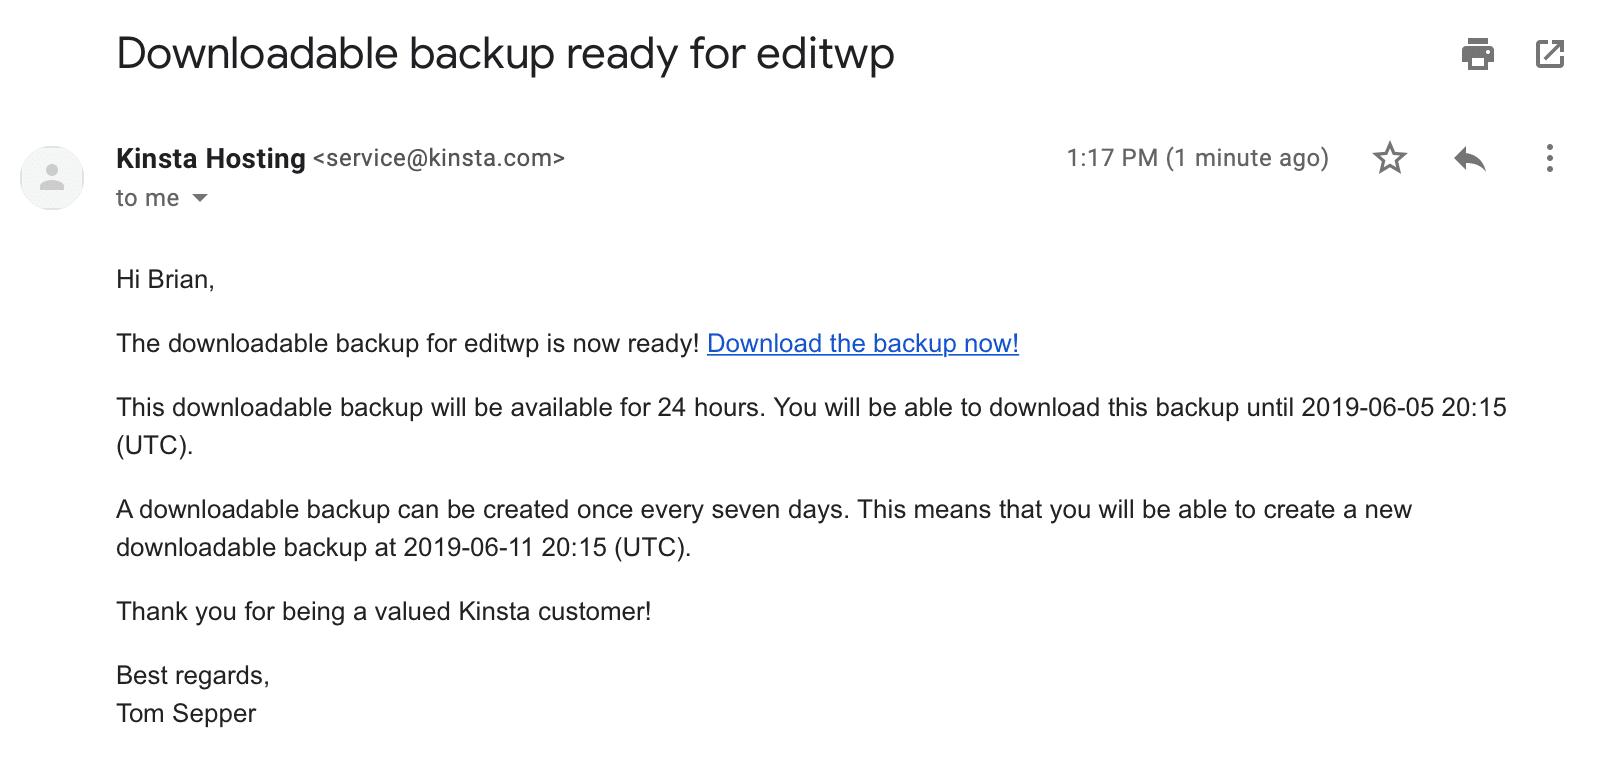 E-mail de backup para download